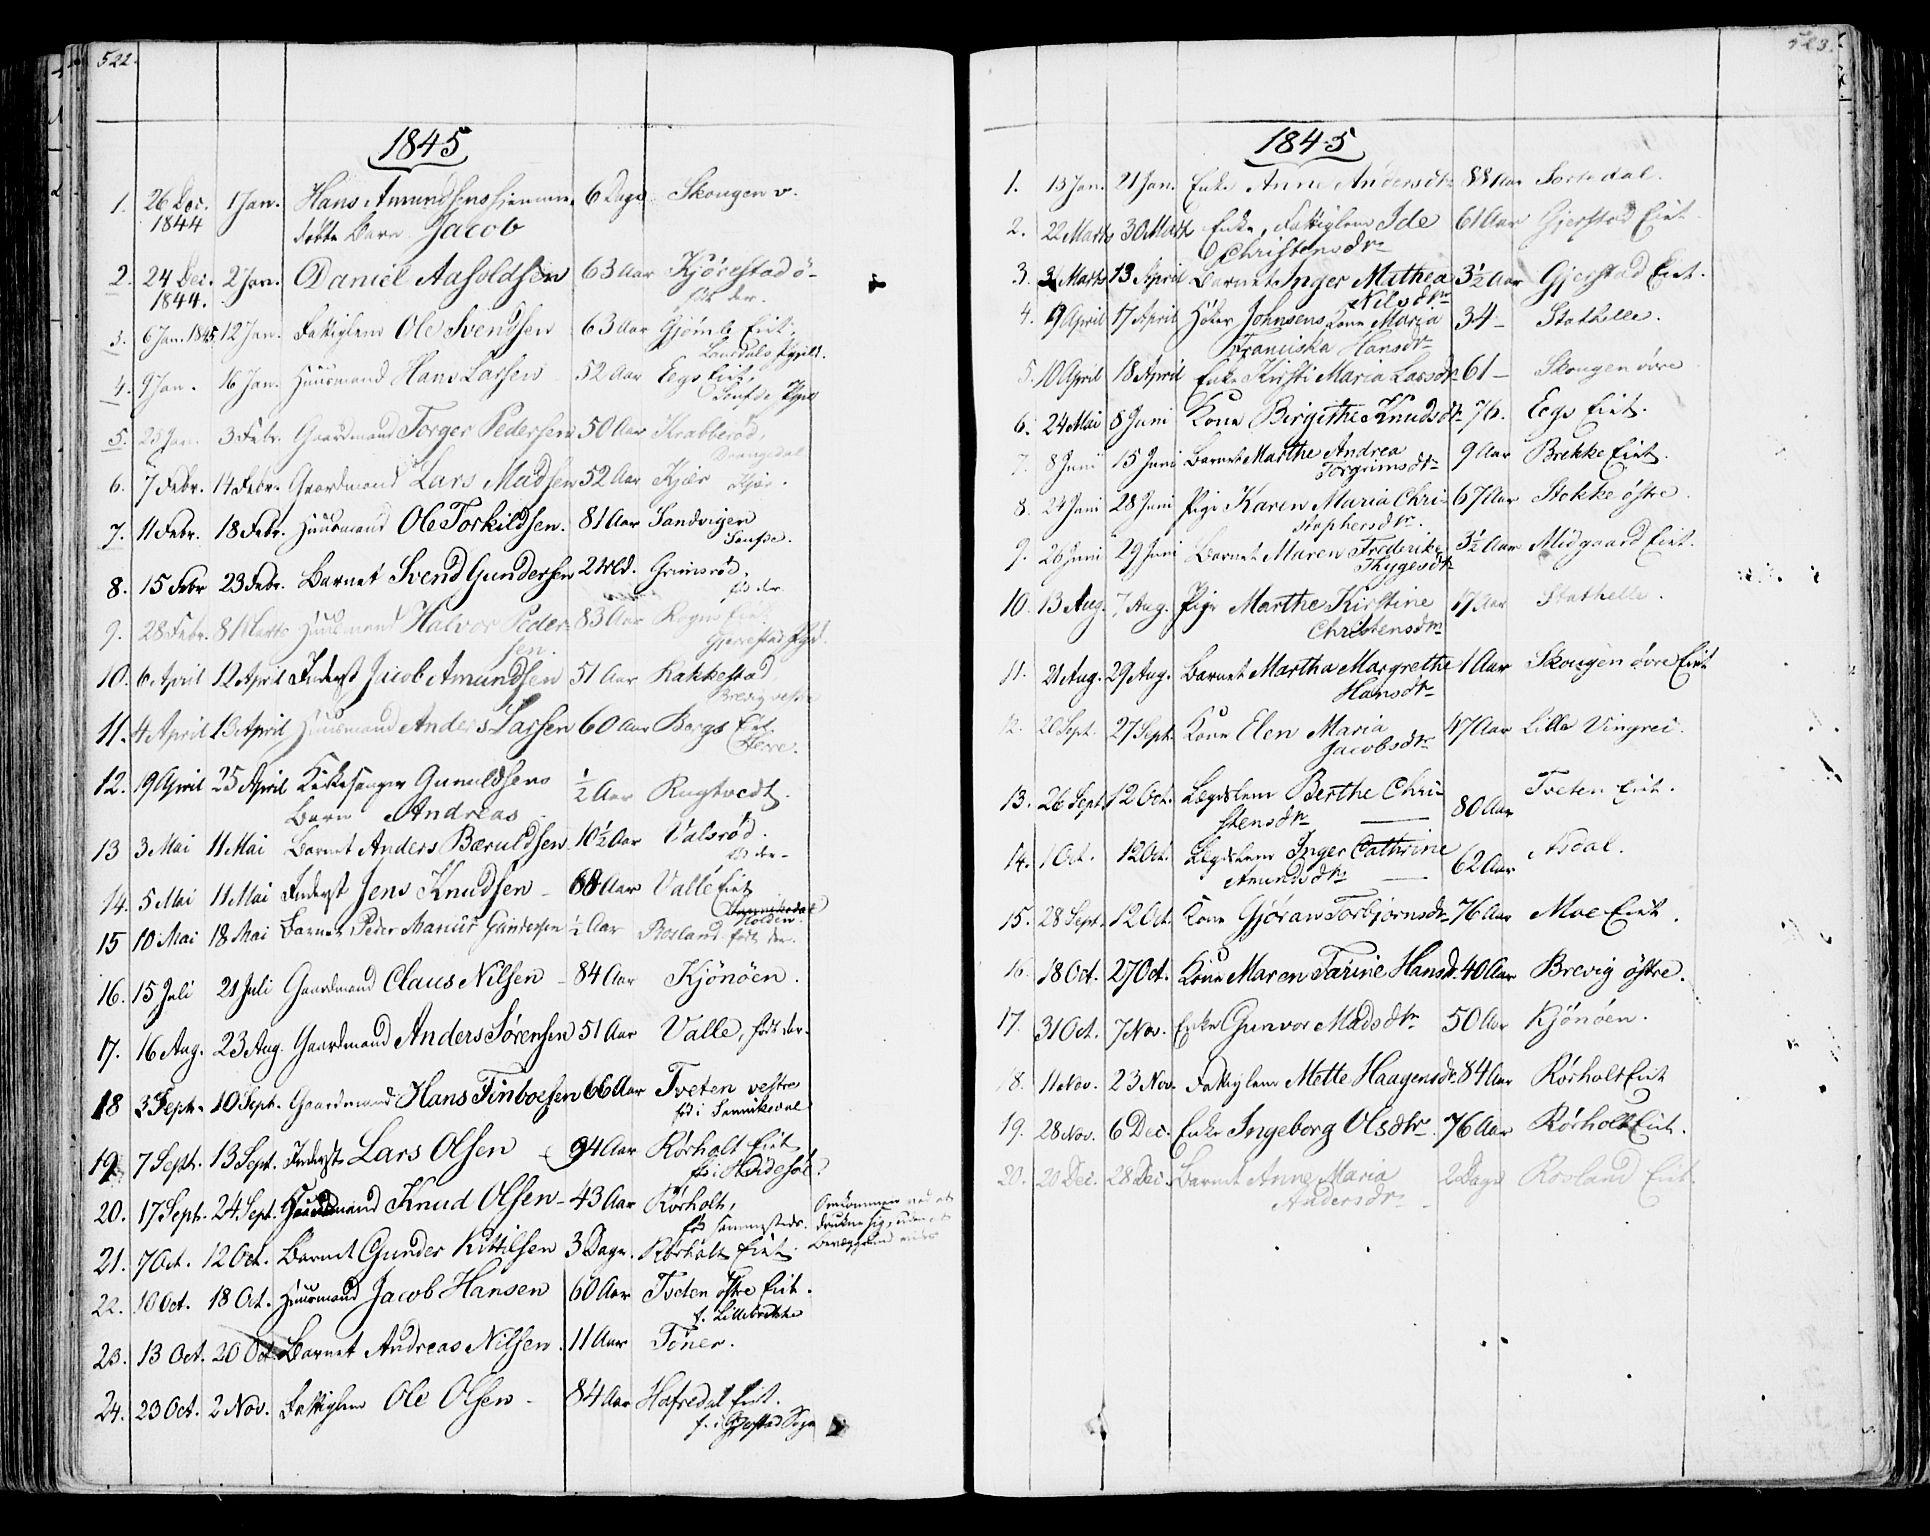 SAKO, Bamble kirkebøker, F/Fa/L0004: Ministerialbok nr. I 4, 1834-1853, s. 522-523